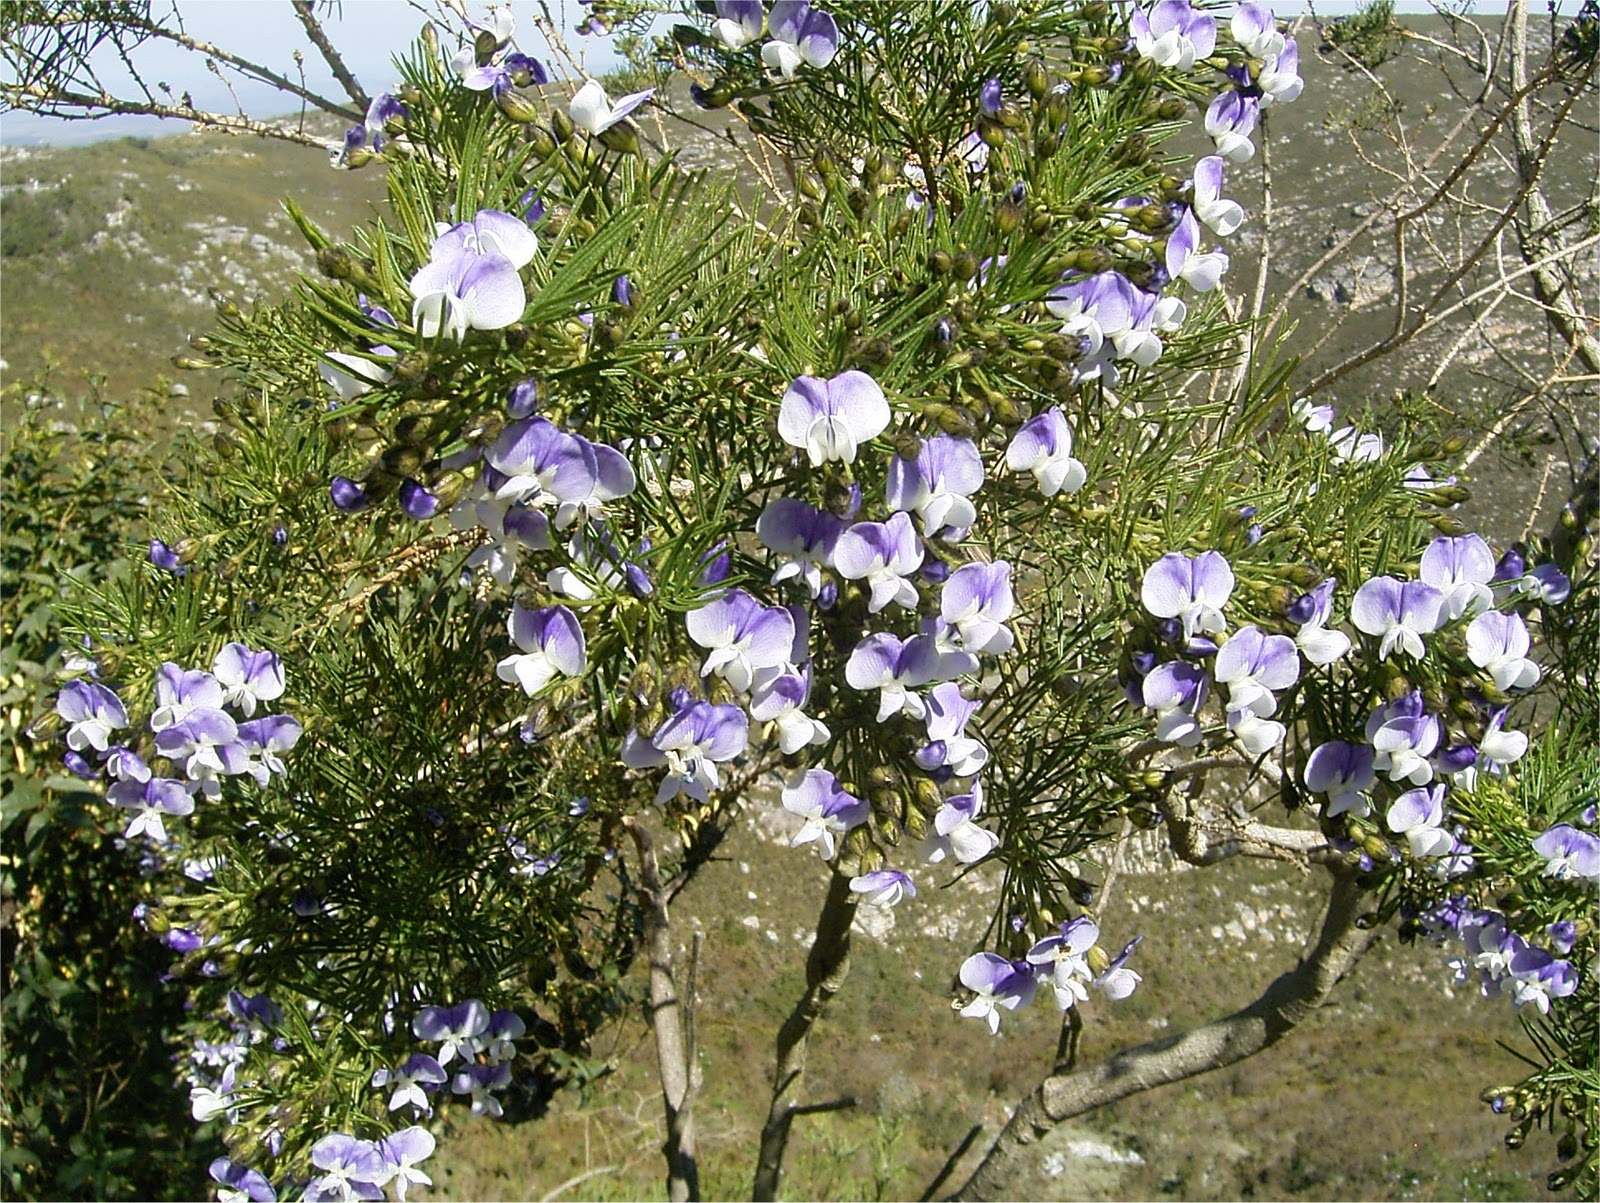 Psoralea affinis flowers